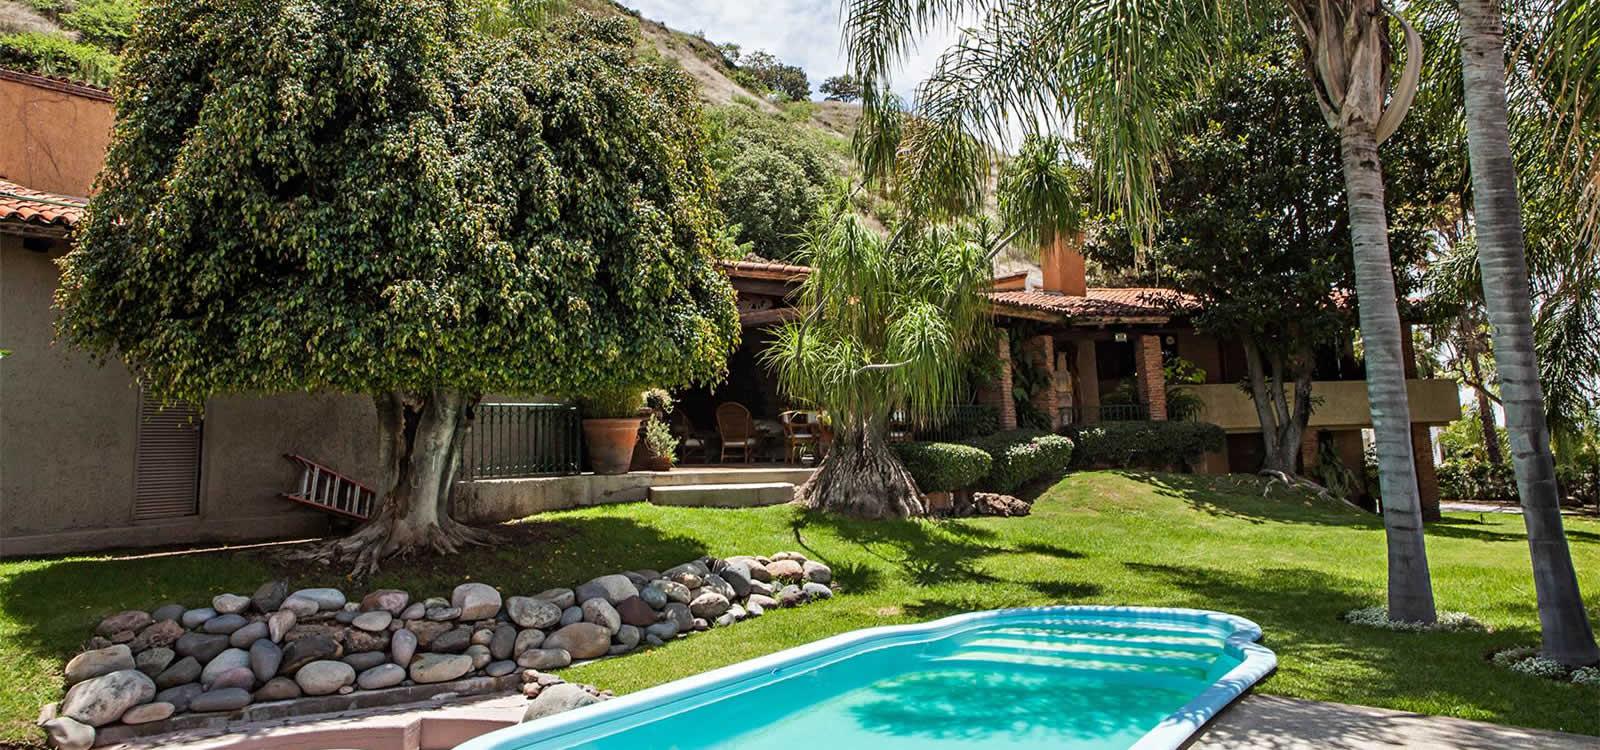 Mexico Guadalajara Santa Anita Club De Golf Home For Sale